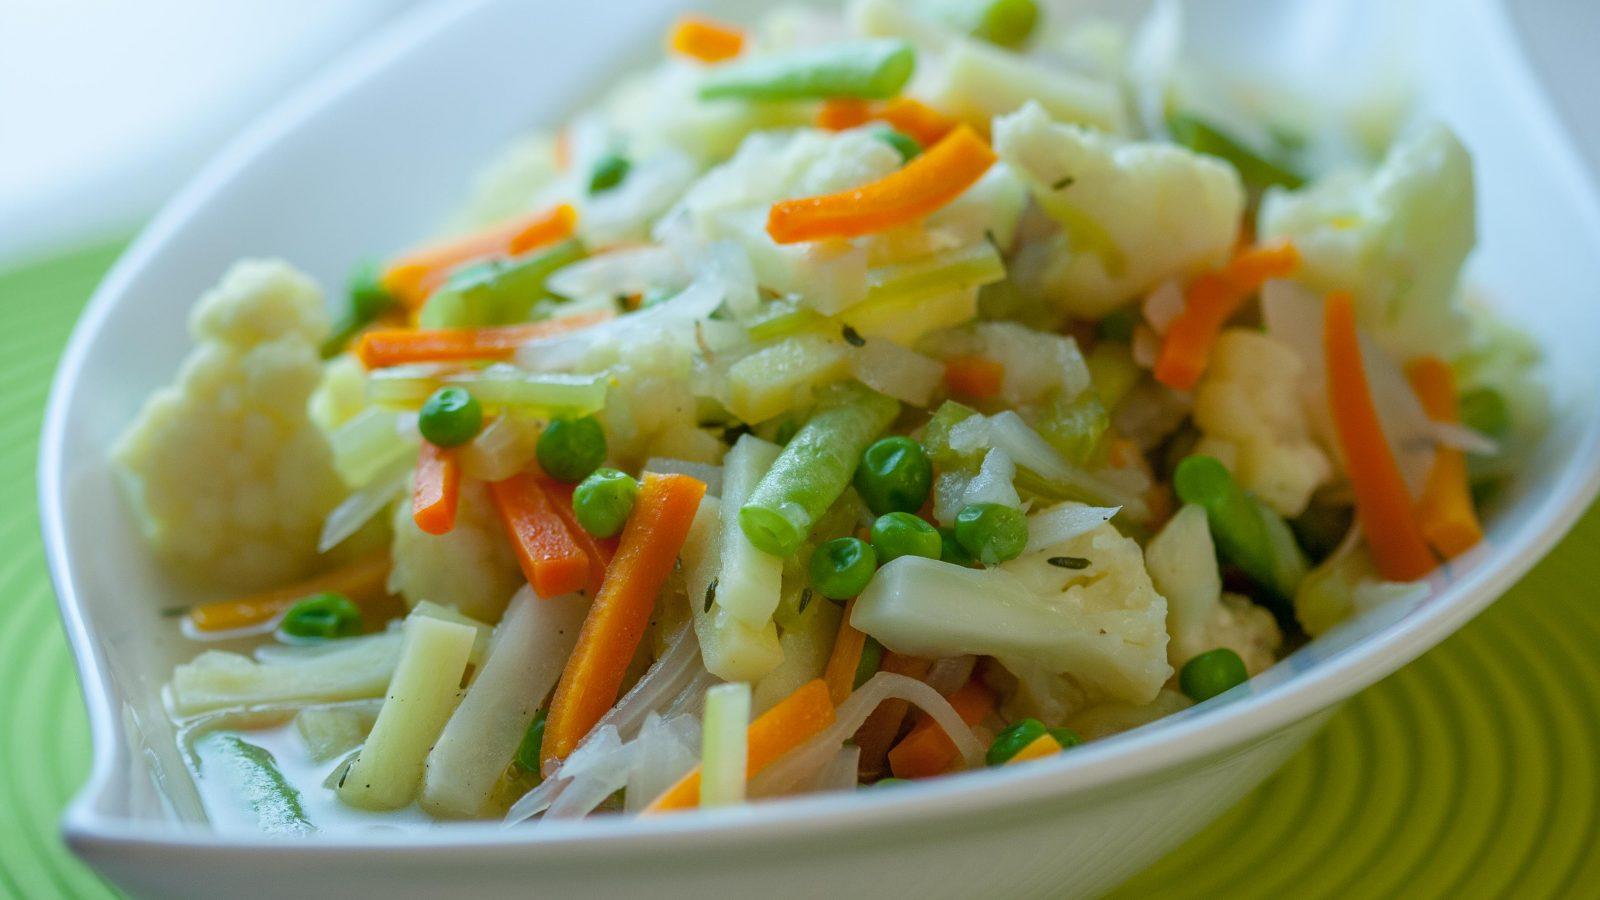 Vegetable Jardiniere Online Culinary School Ocs